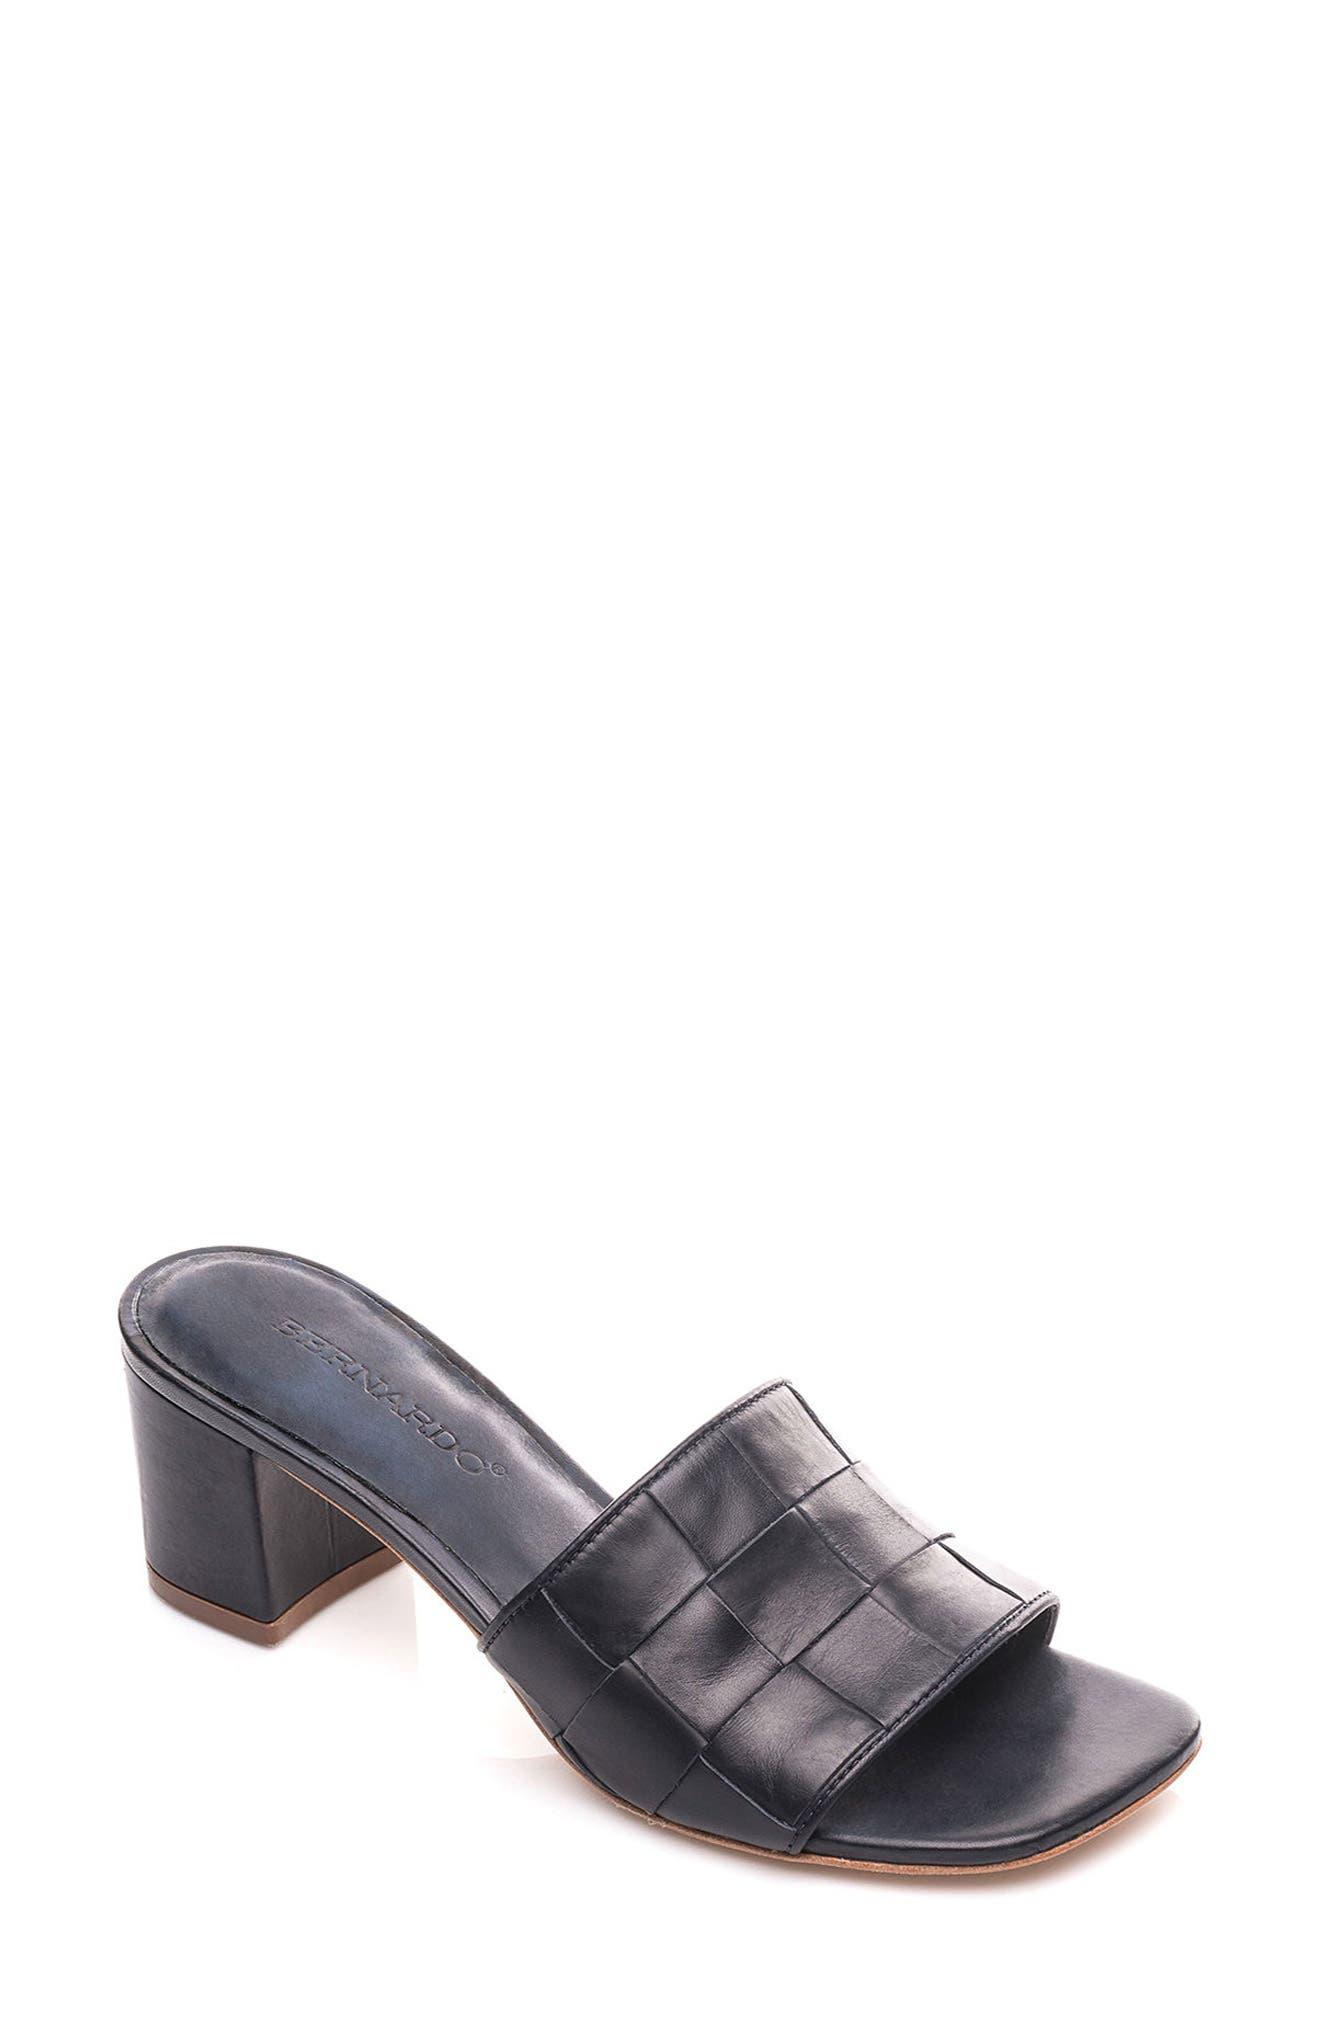 Main Image - Bernardo Bridget Block Heel Sandal (Women)